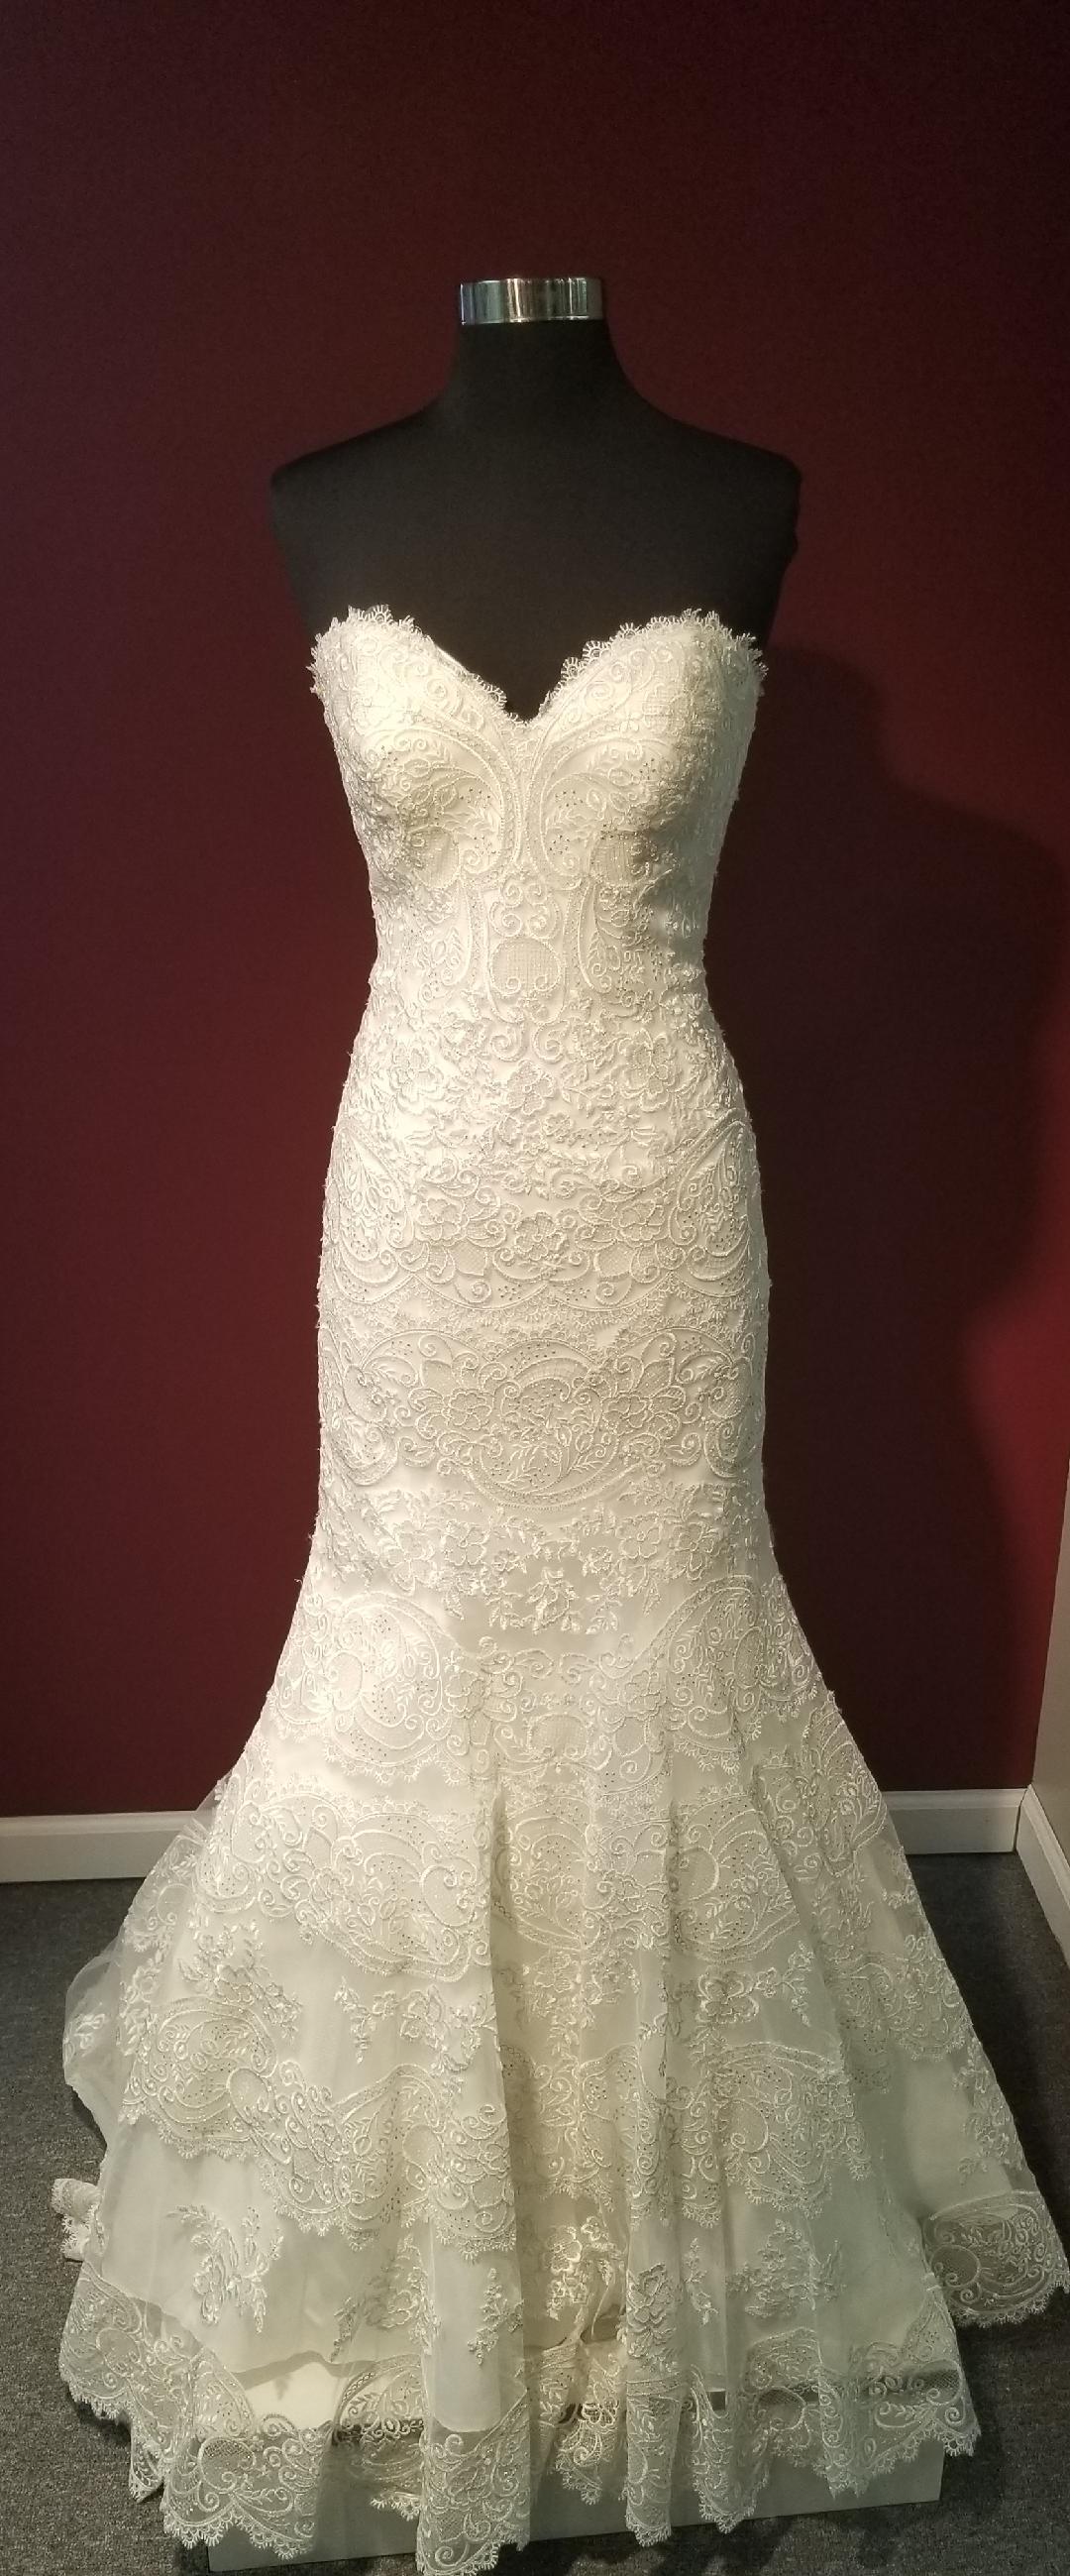 10% Off Wedding Dress Sale